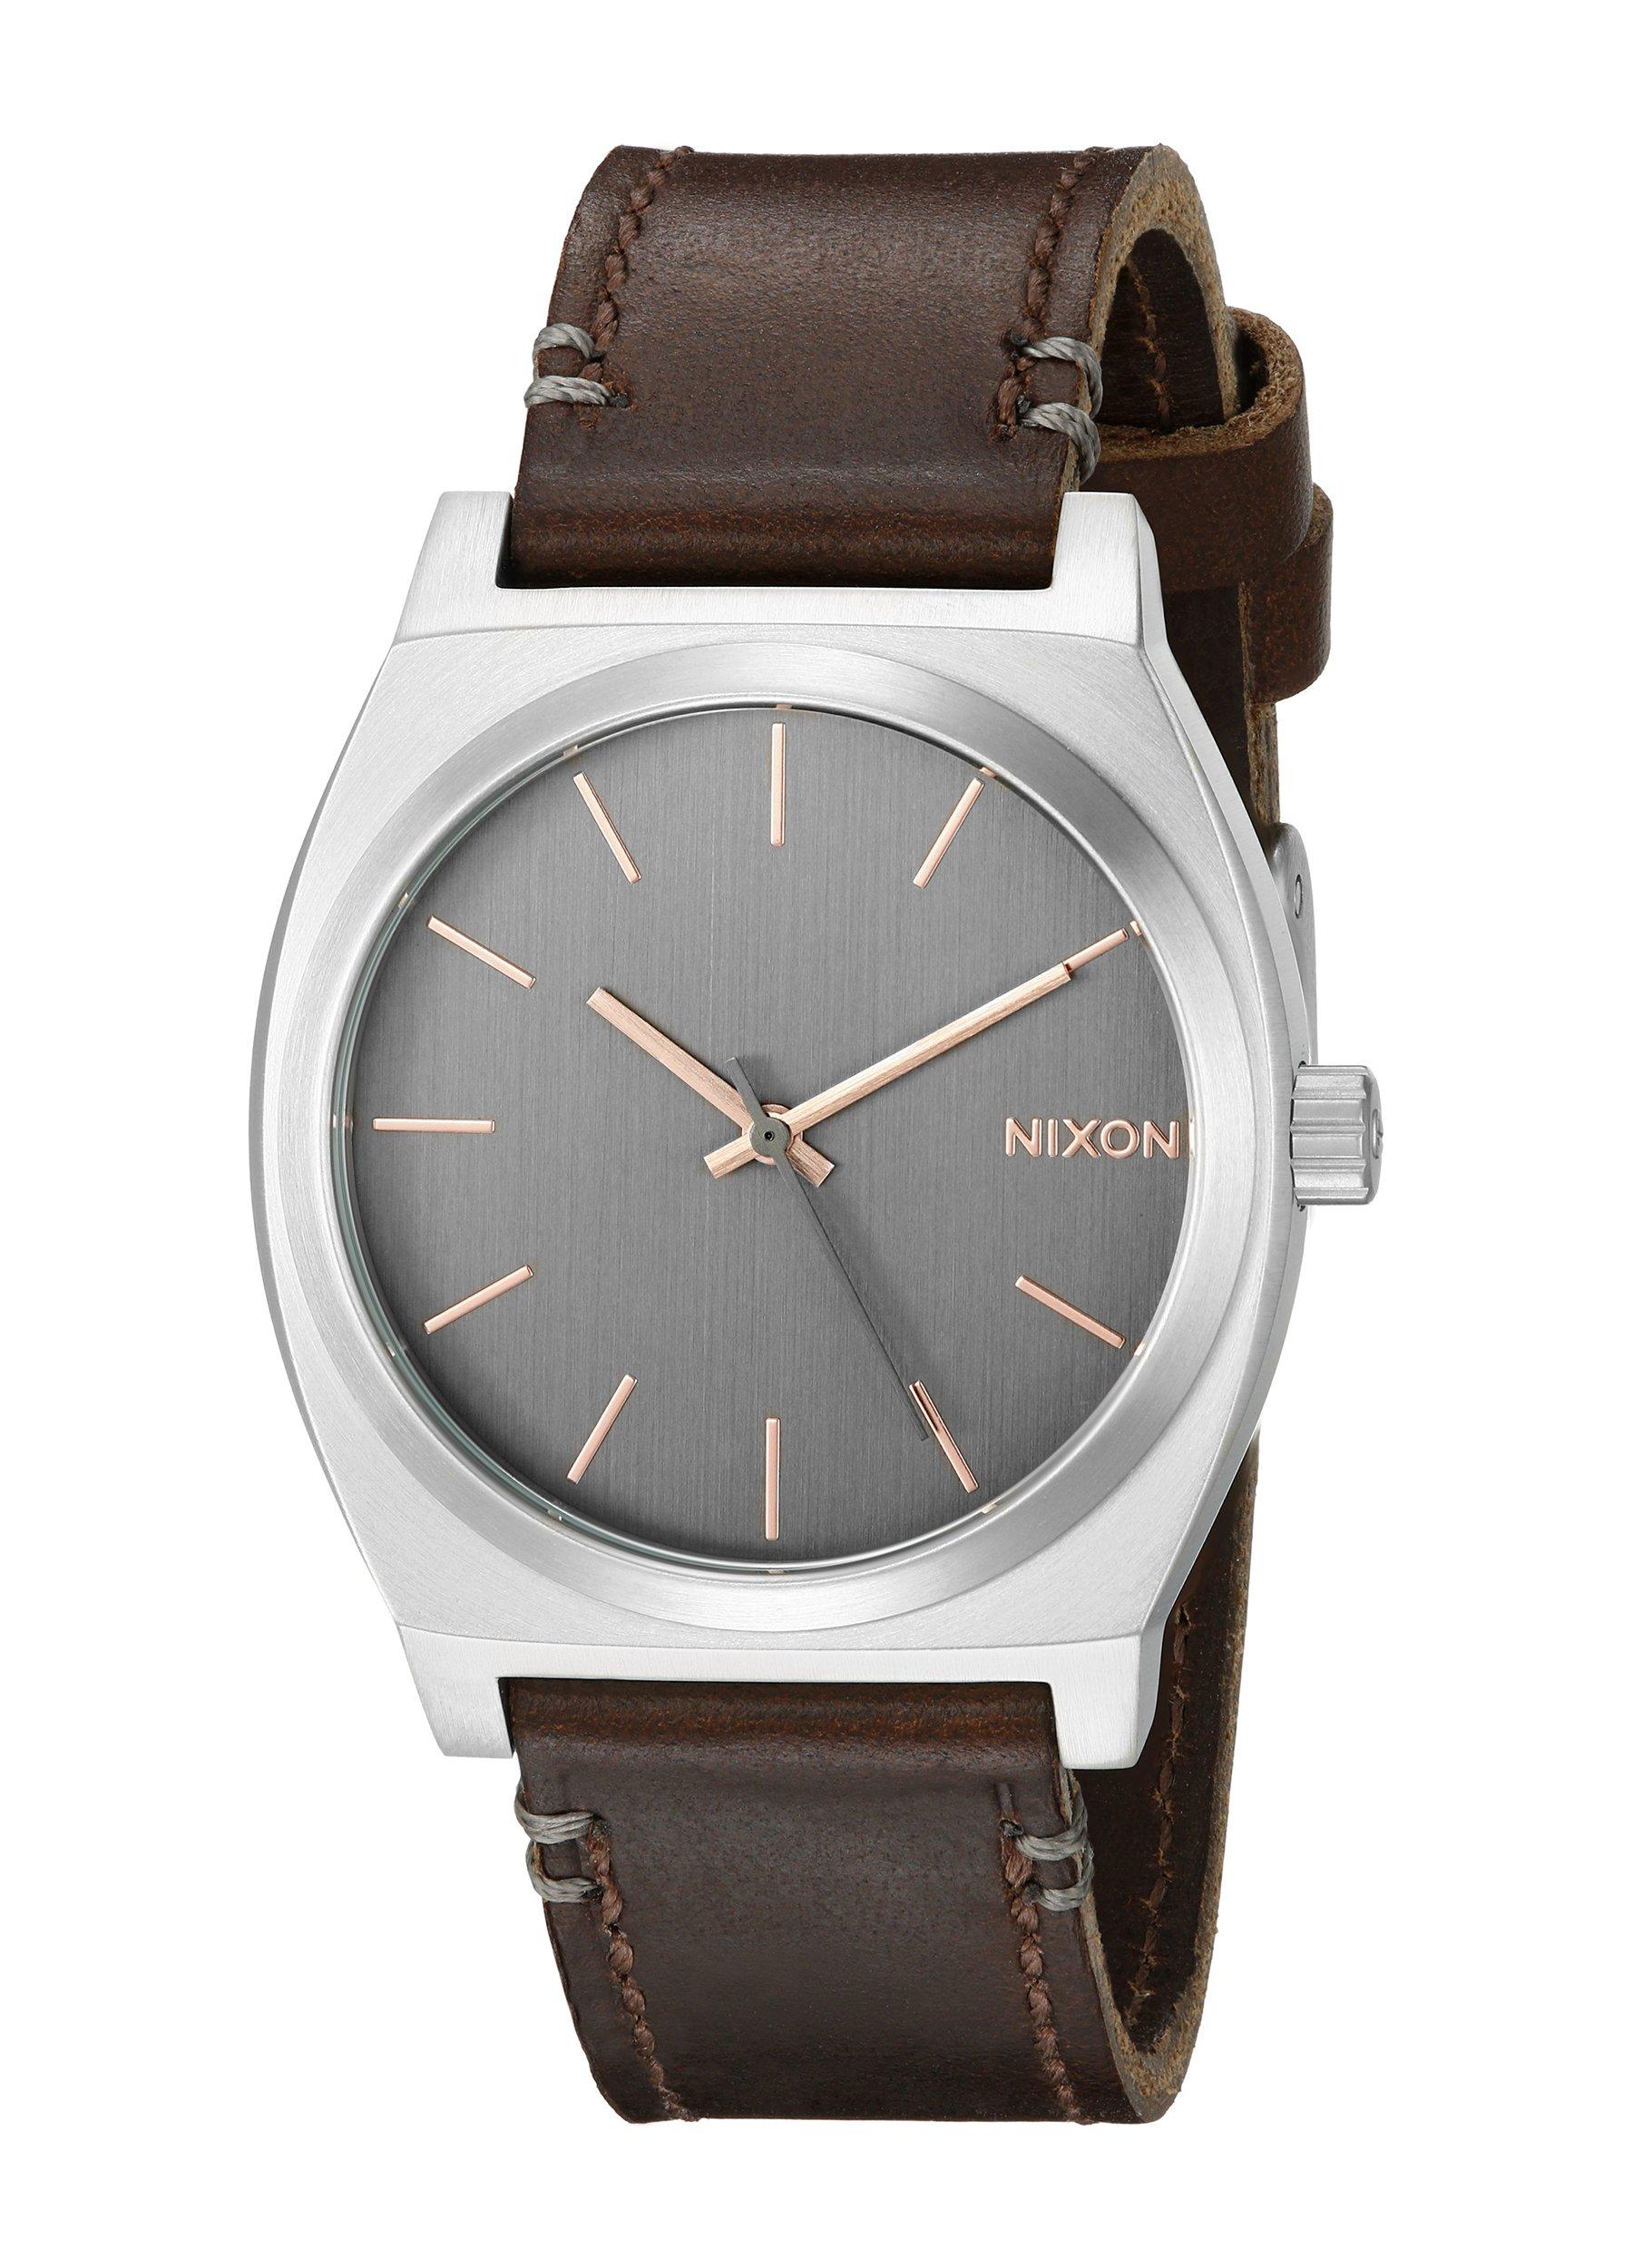 NIXON A0452066 Men's Time Teller Gray/Rose Gold Analog Display Quartz Watch, Brown Leather Band, Round 37mm Case